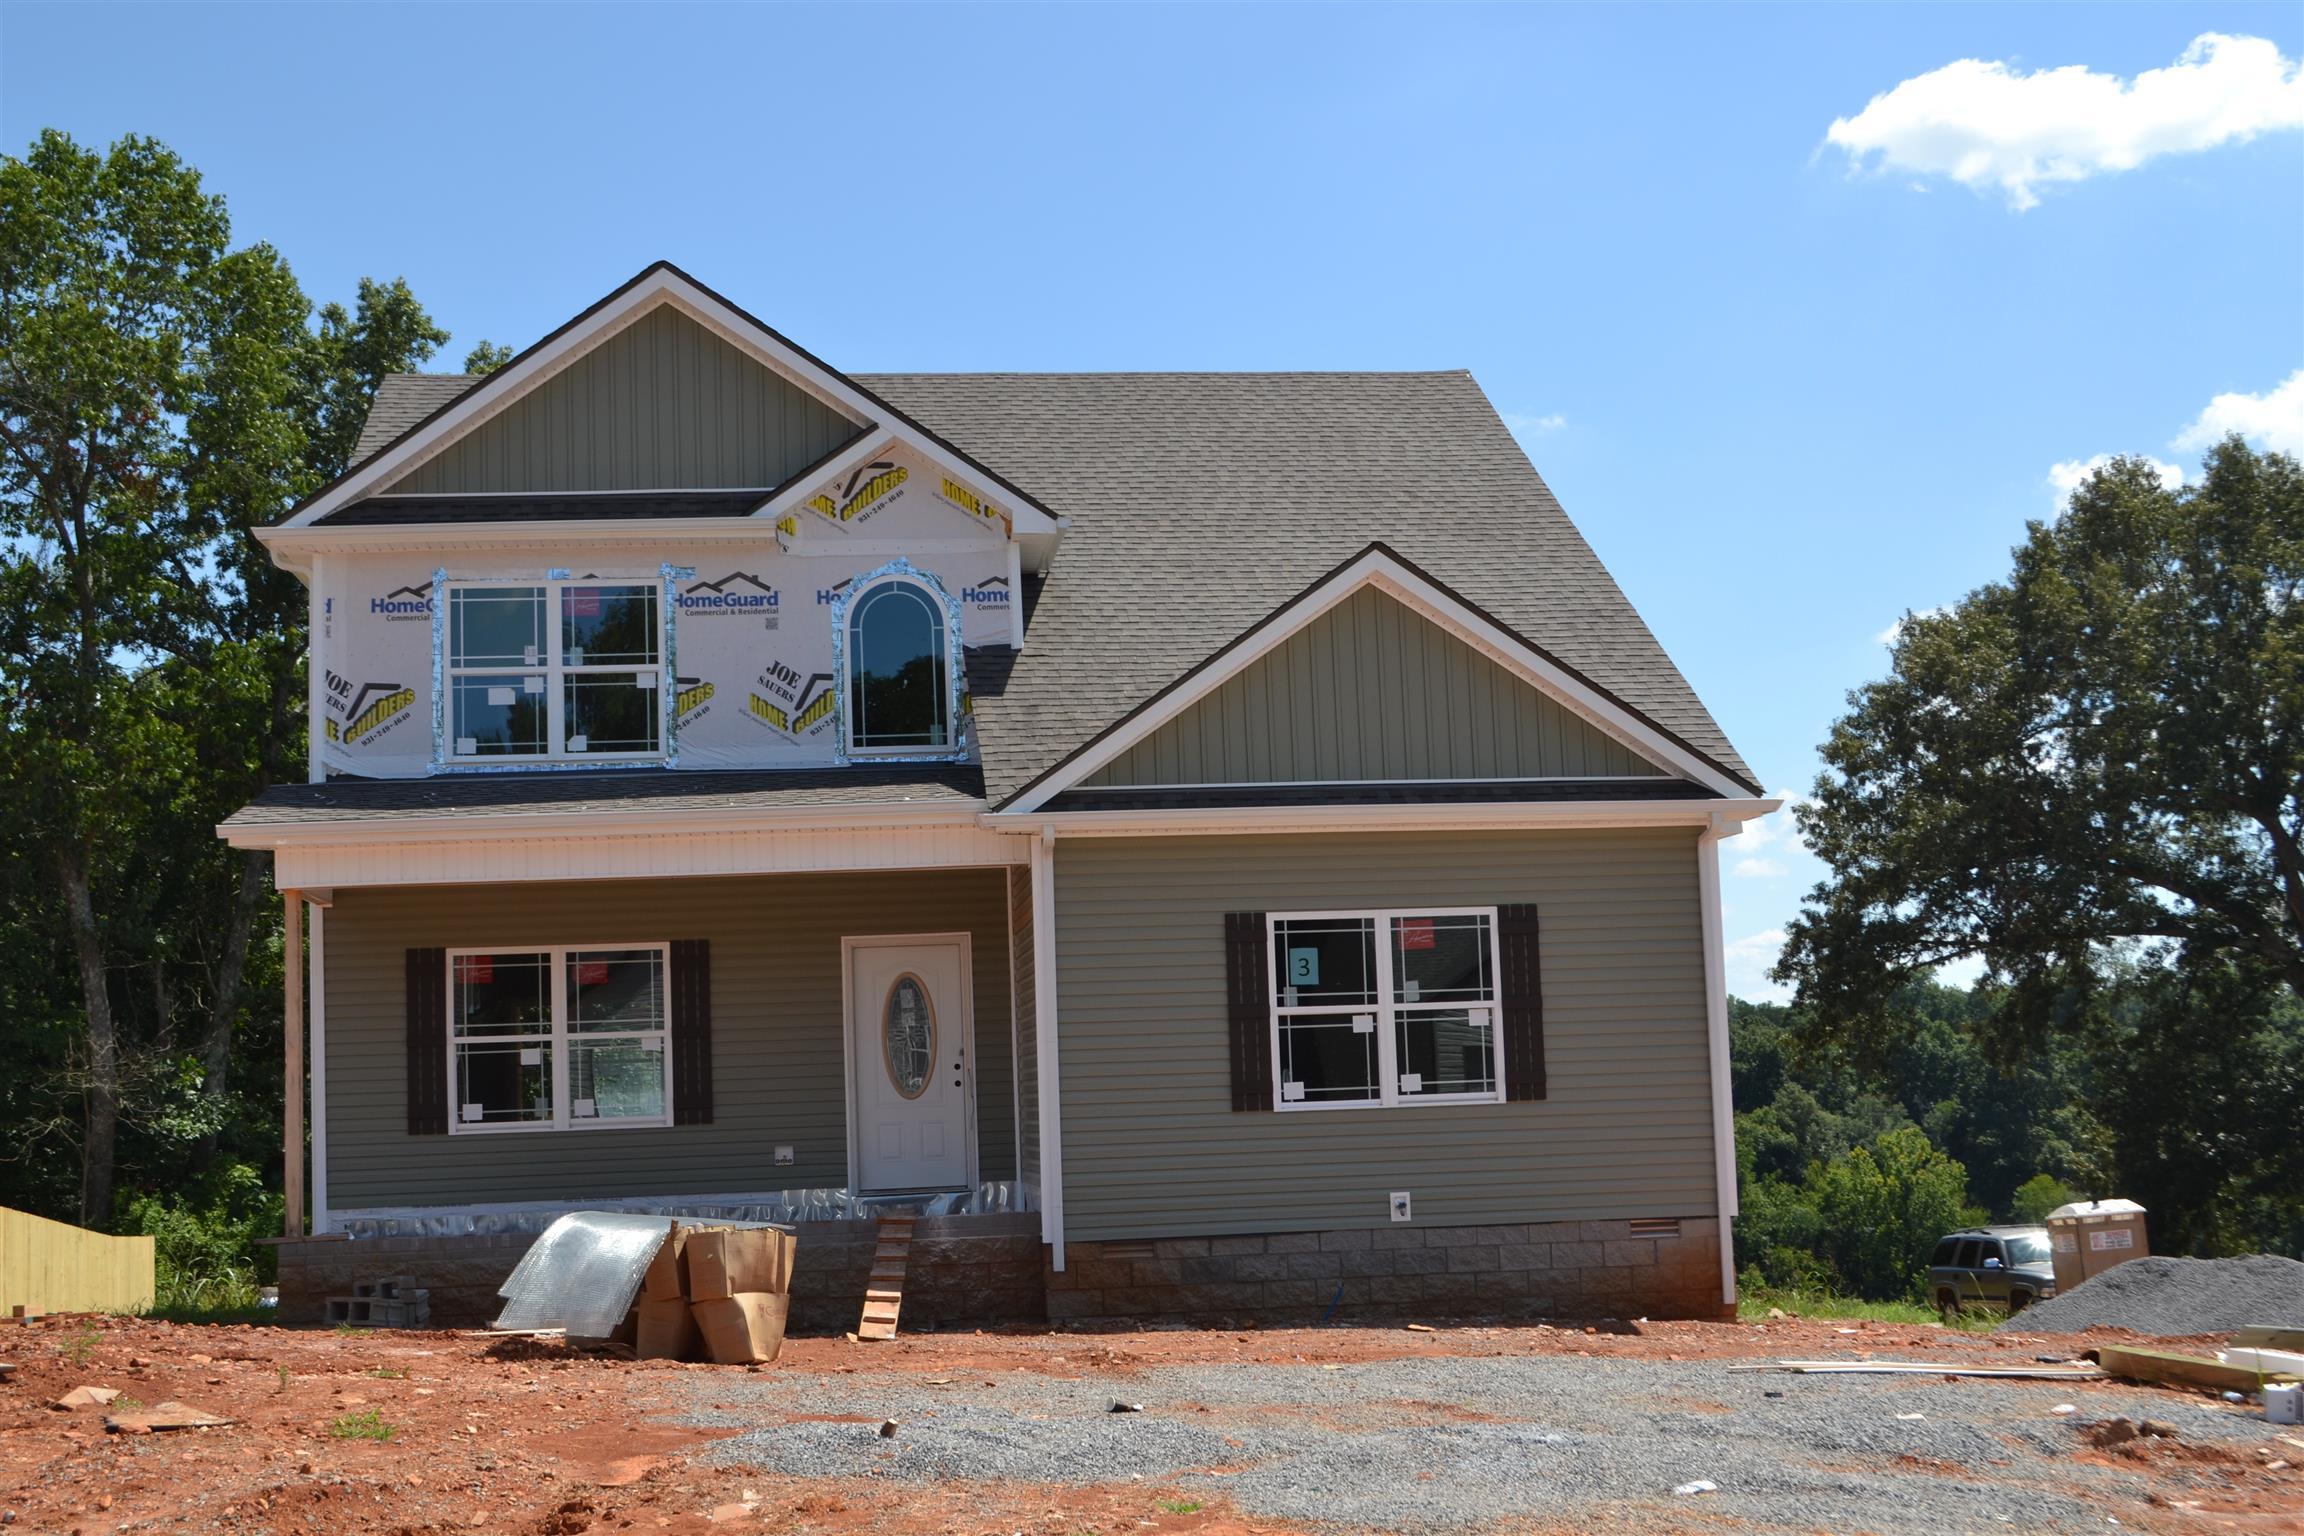 1803 Rains Rd, Clarksville, TN 37042 - Clarksville, TN real estate listing